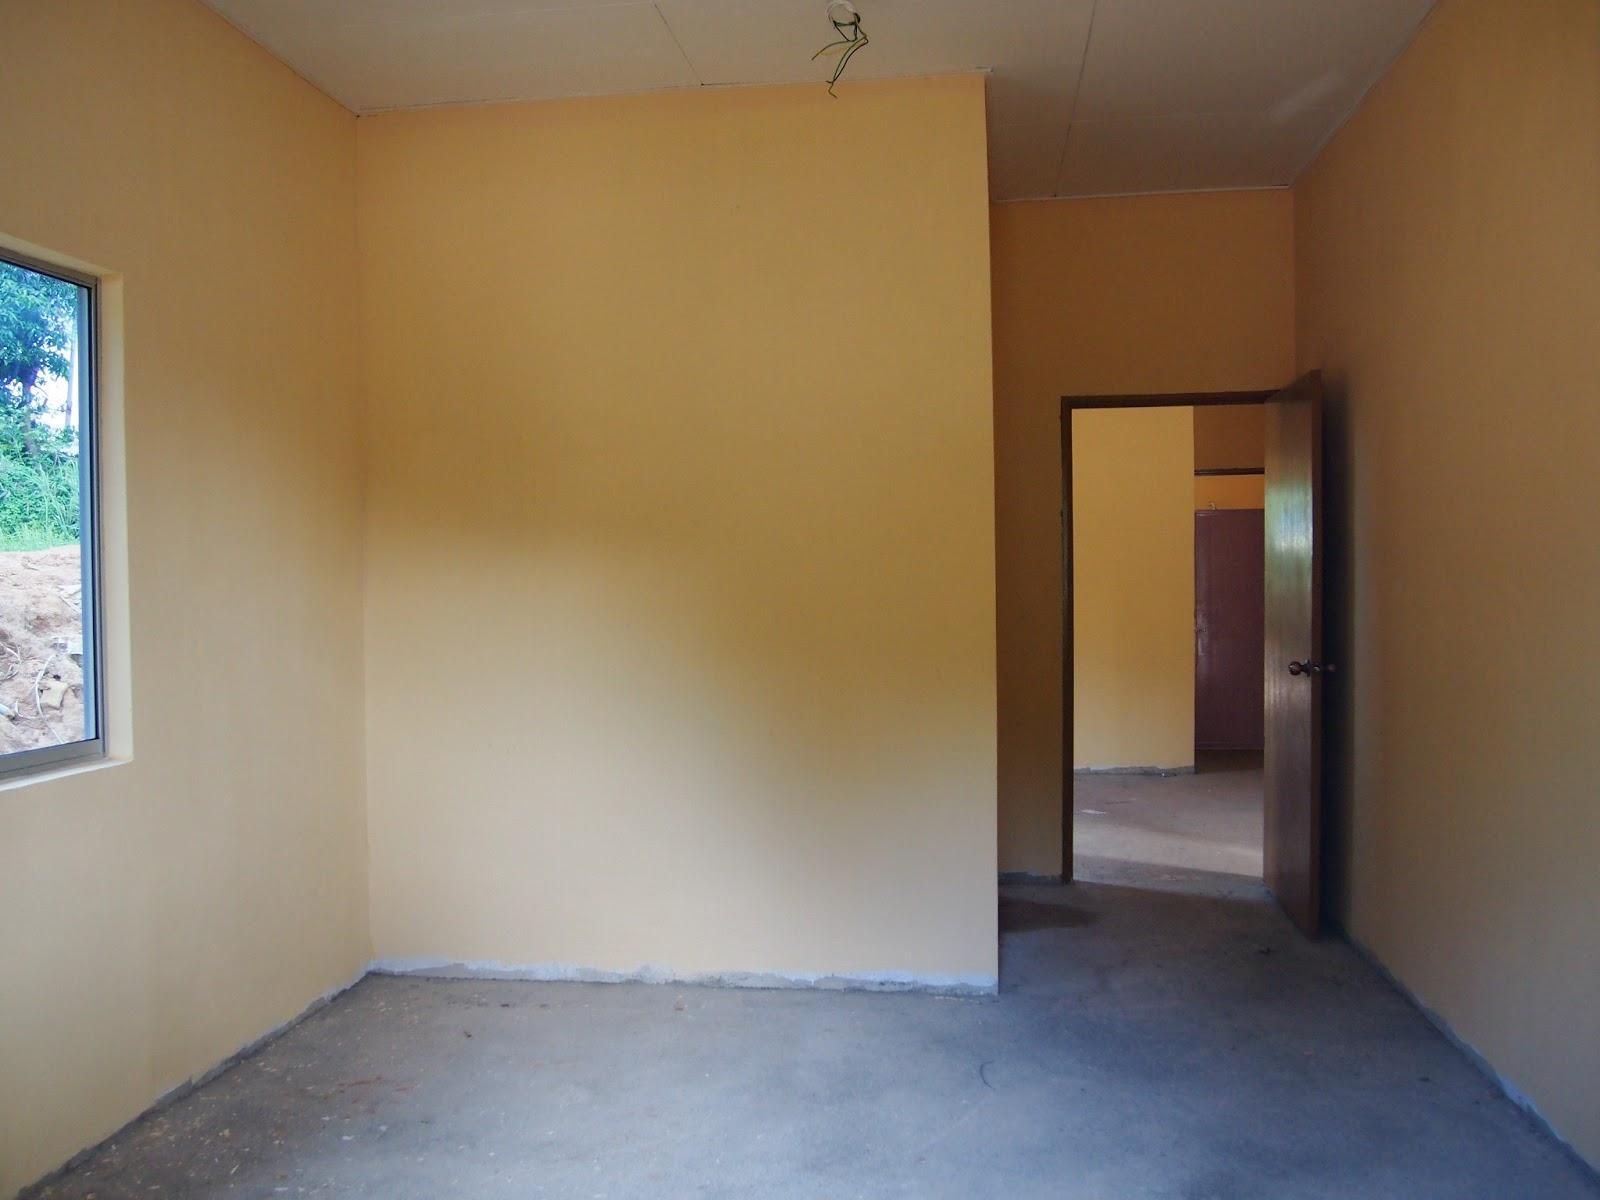 Hiasan Ruang Tamu Rumah Mesra Rakyat  Desainrumahidcom